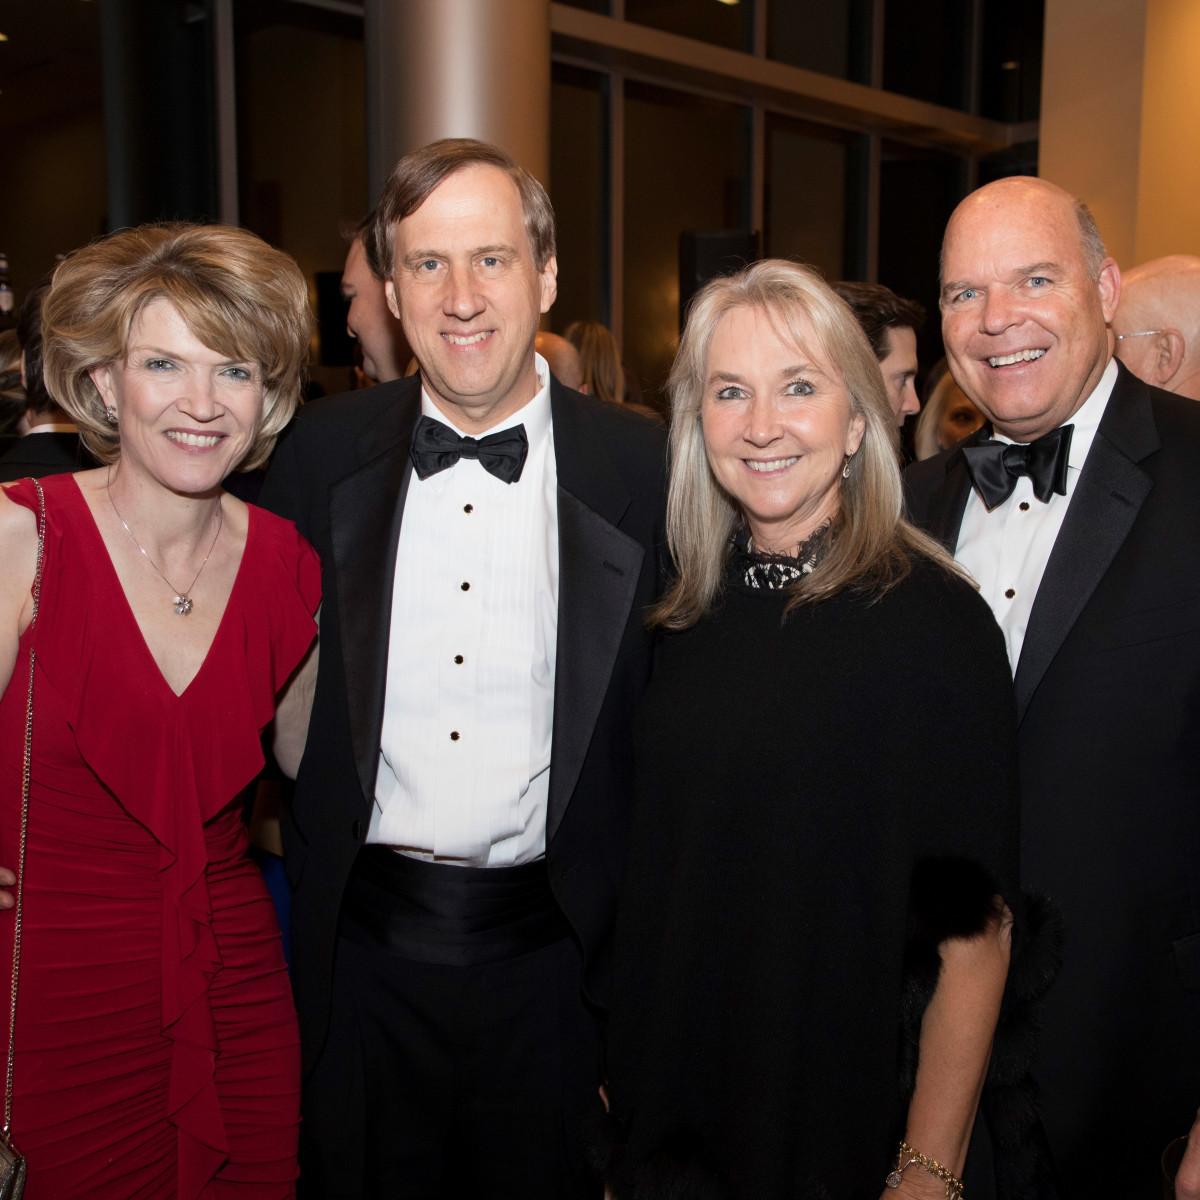 Jeff & Judy Schmeltekopf, Keith & Jennifer Cerny